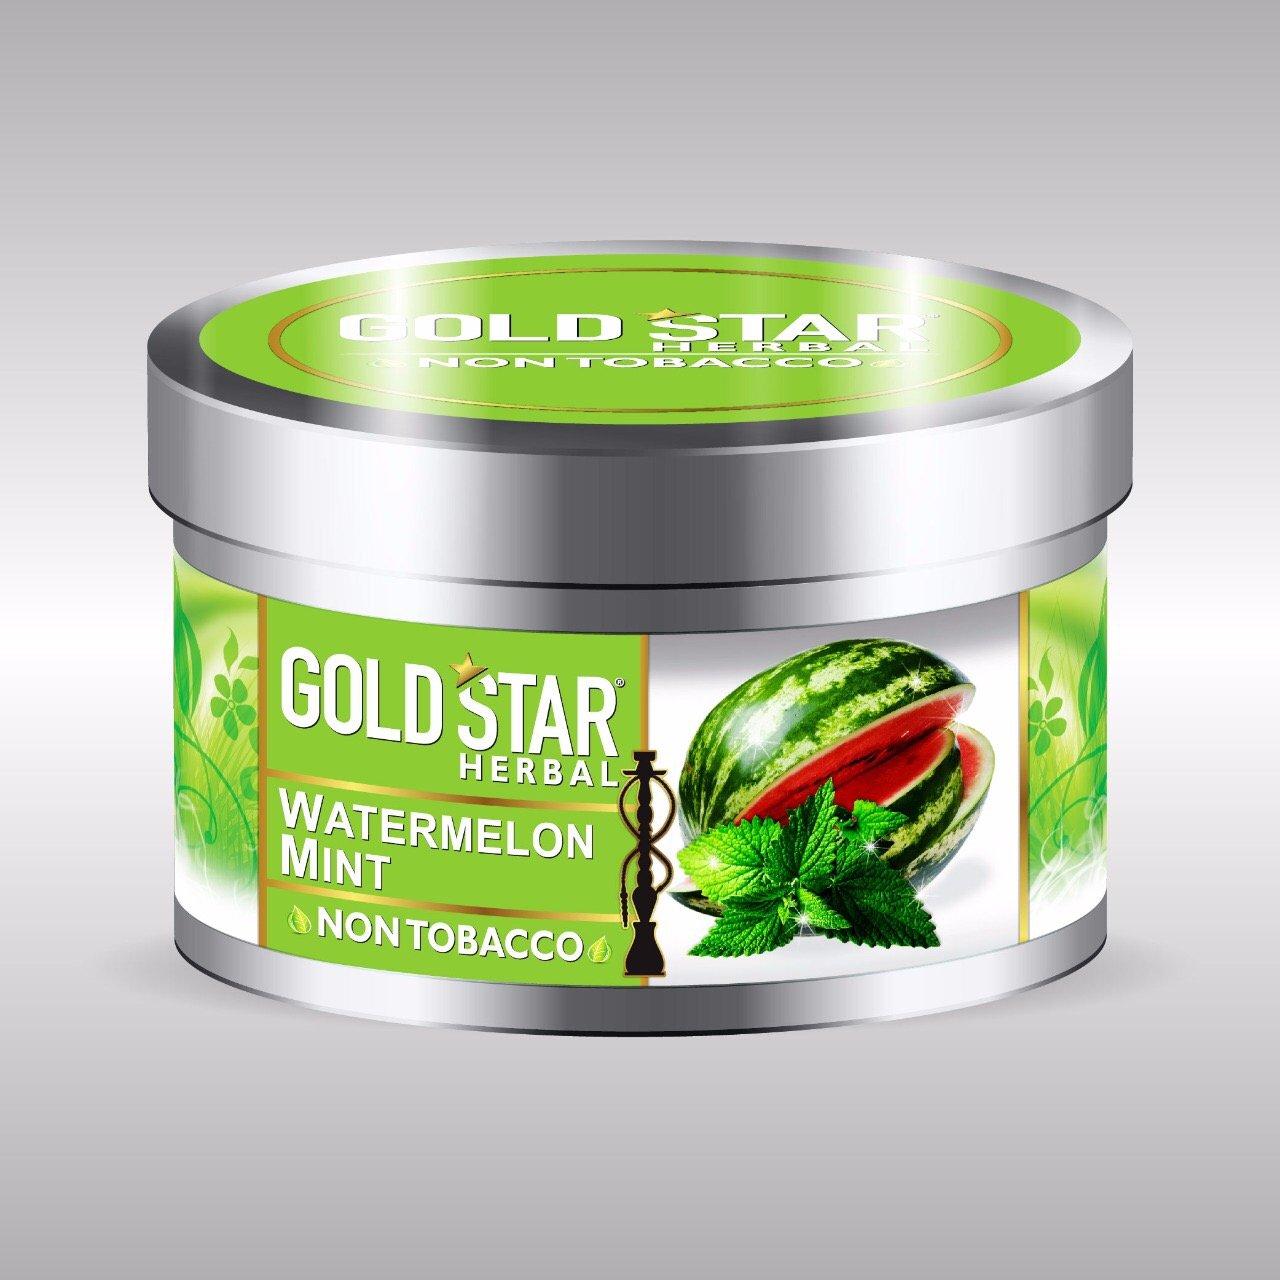 GOLDSTAR Herbal NON Tobacco Smoke WATERMELON MINT Flavor Premium Hookah 200 gm